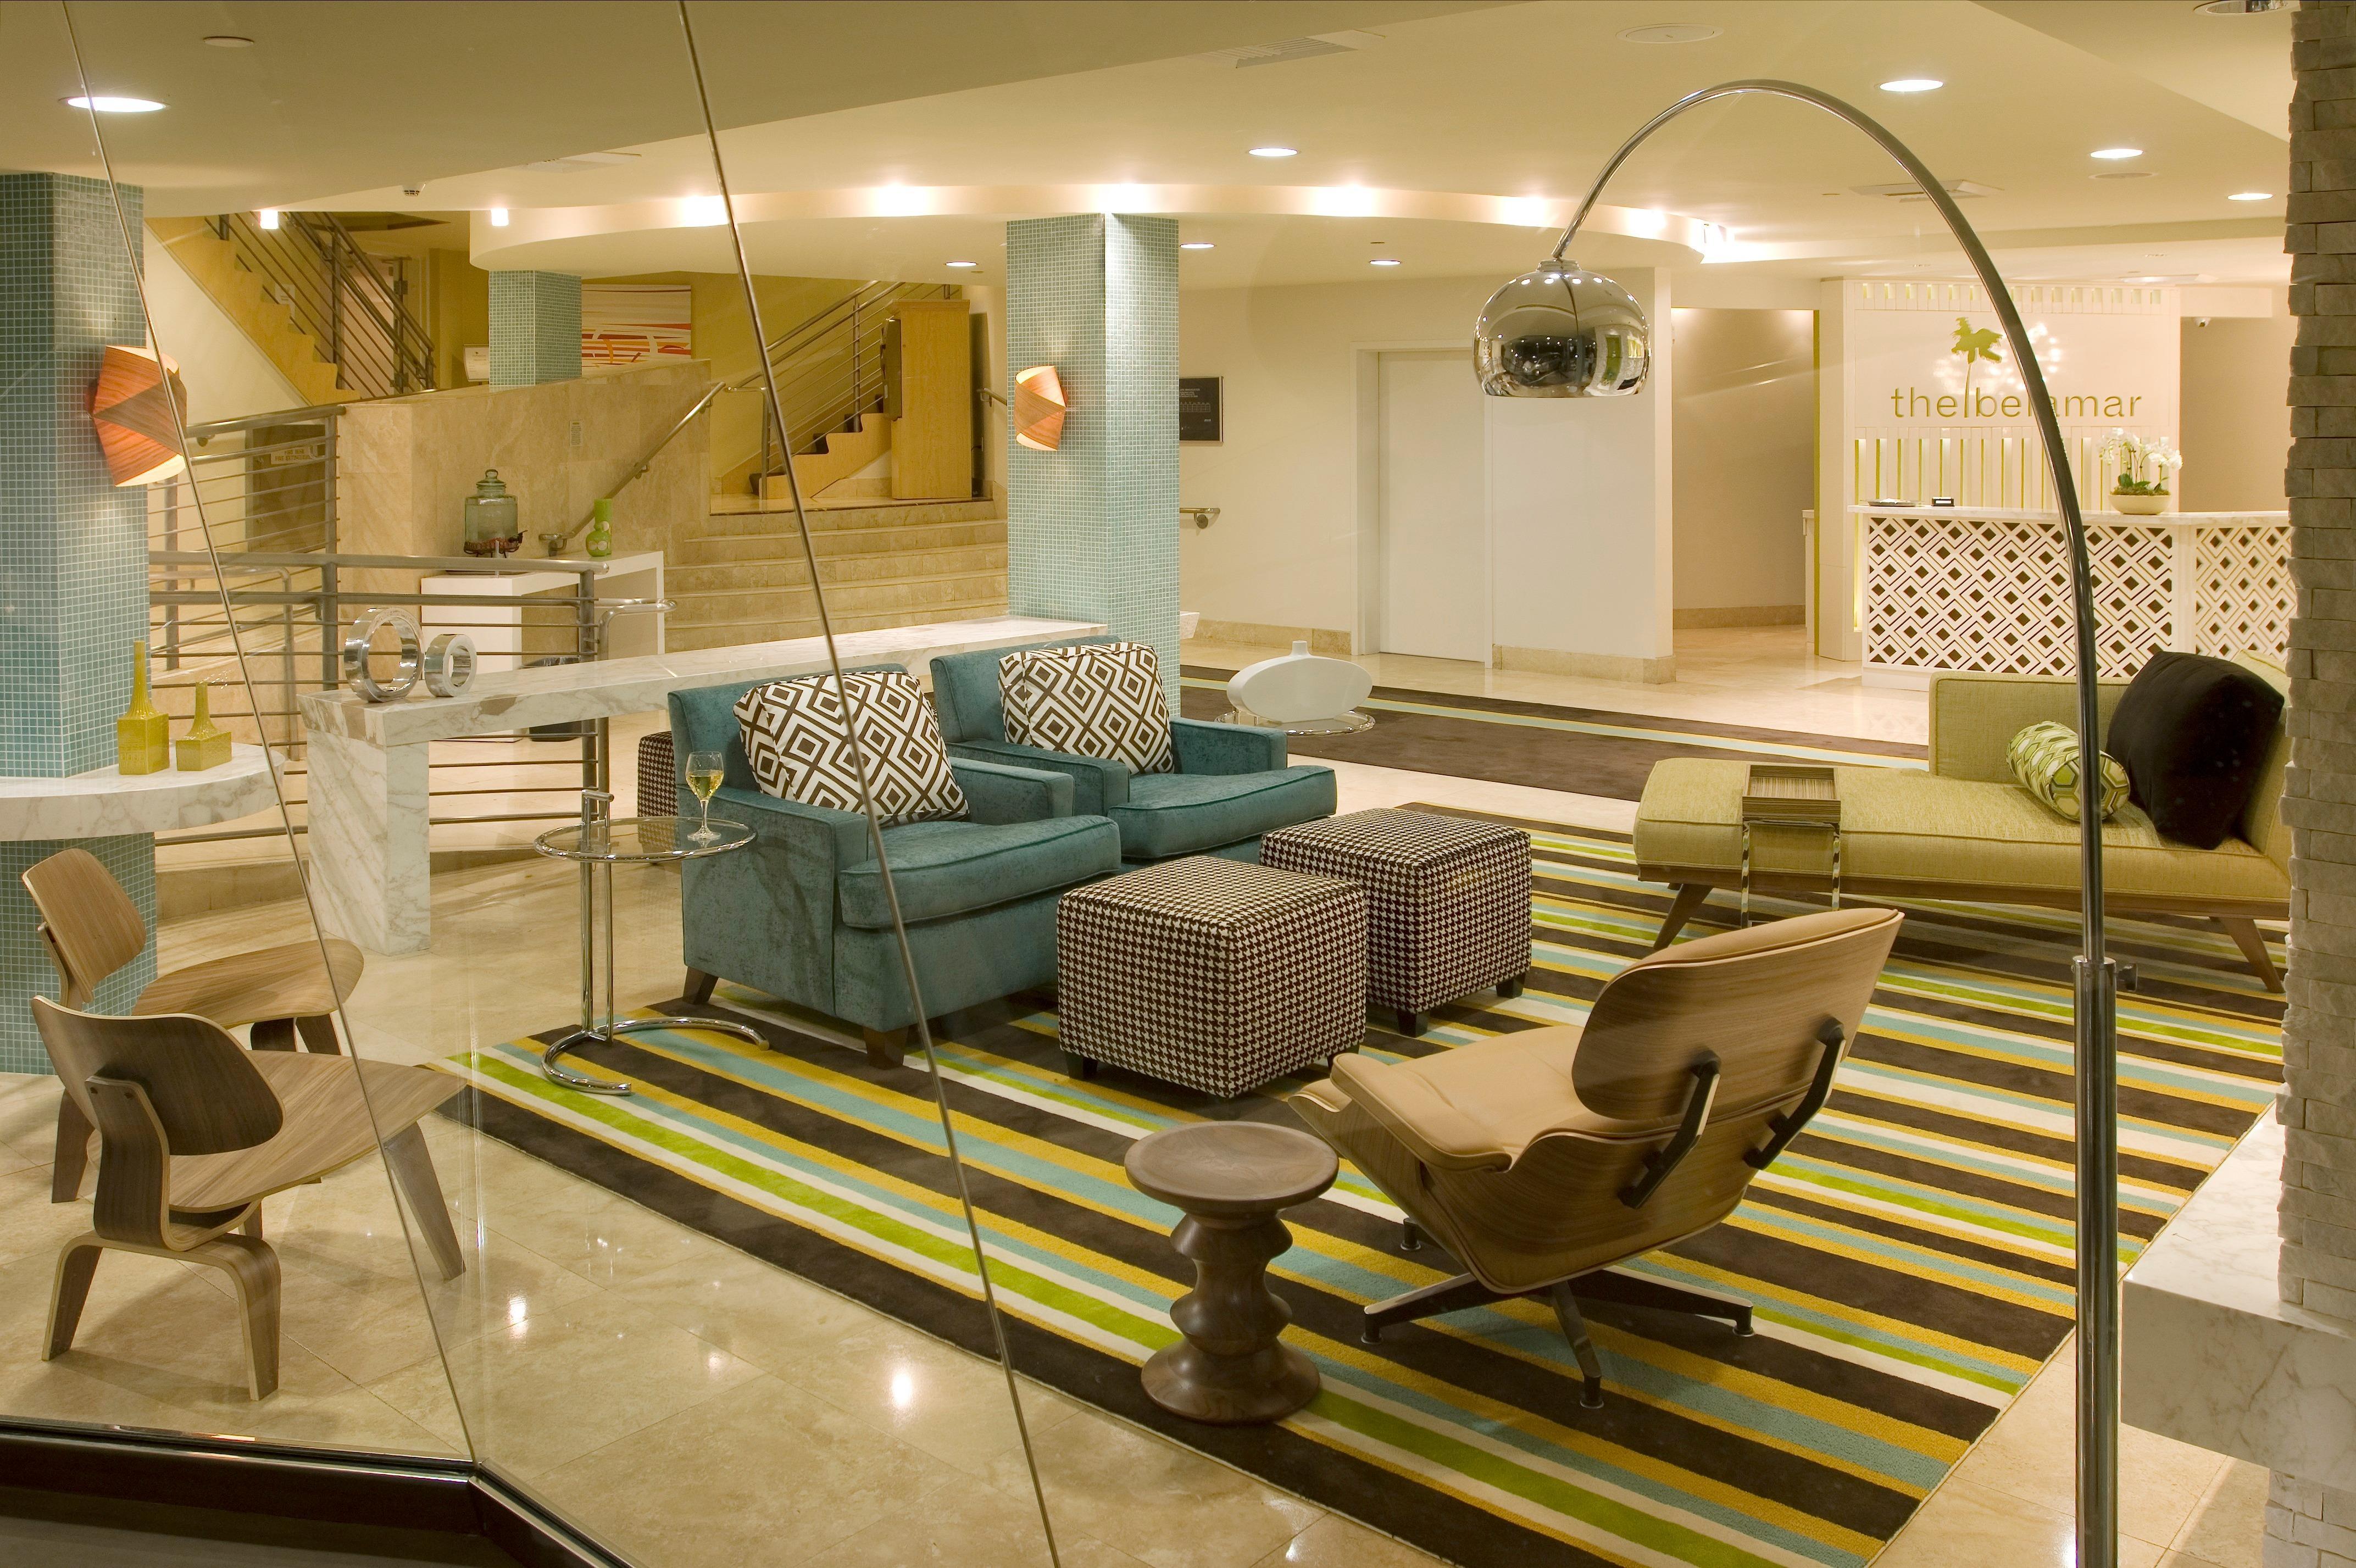 Belamar Hotel Miami Beach